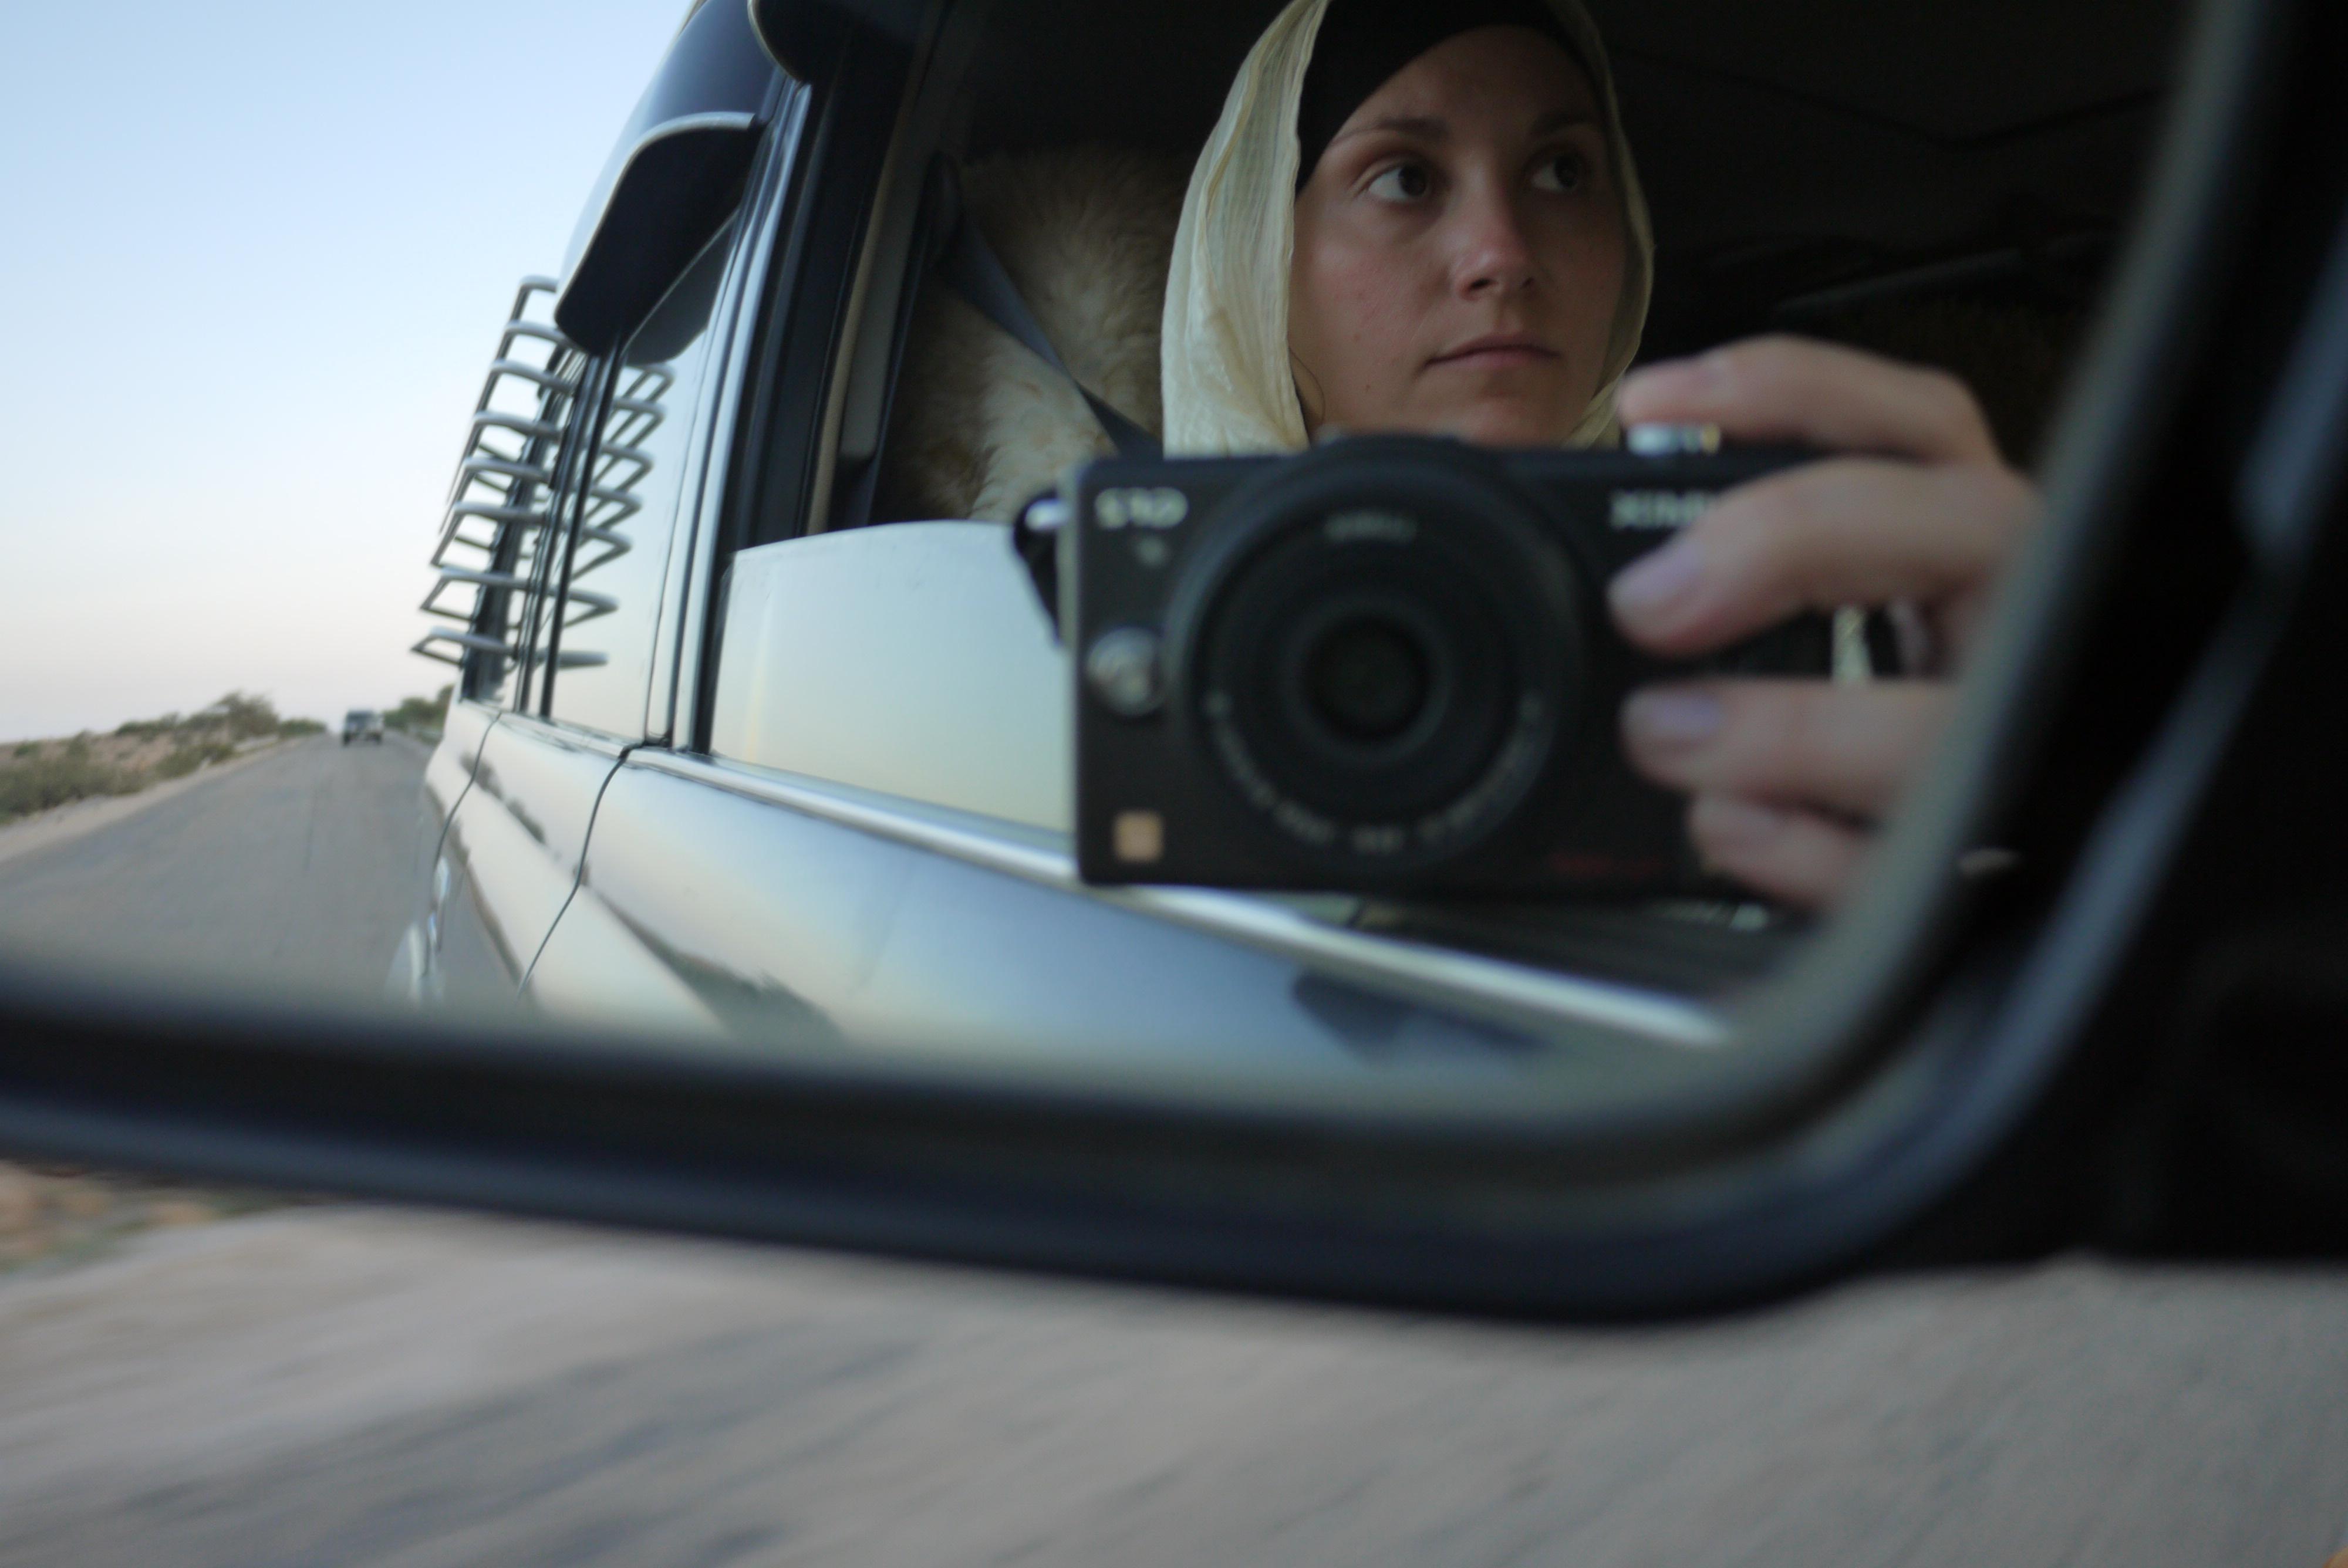 Anna with camera